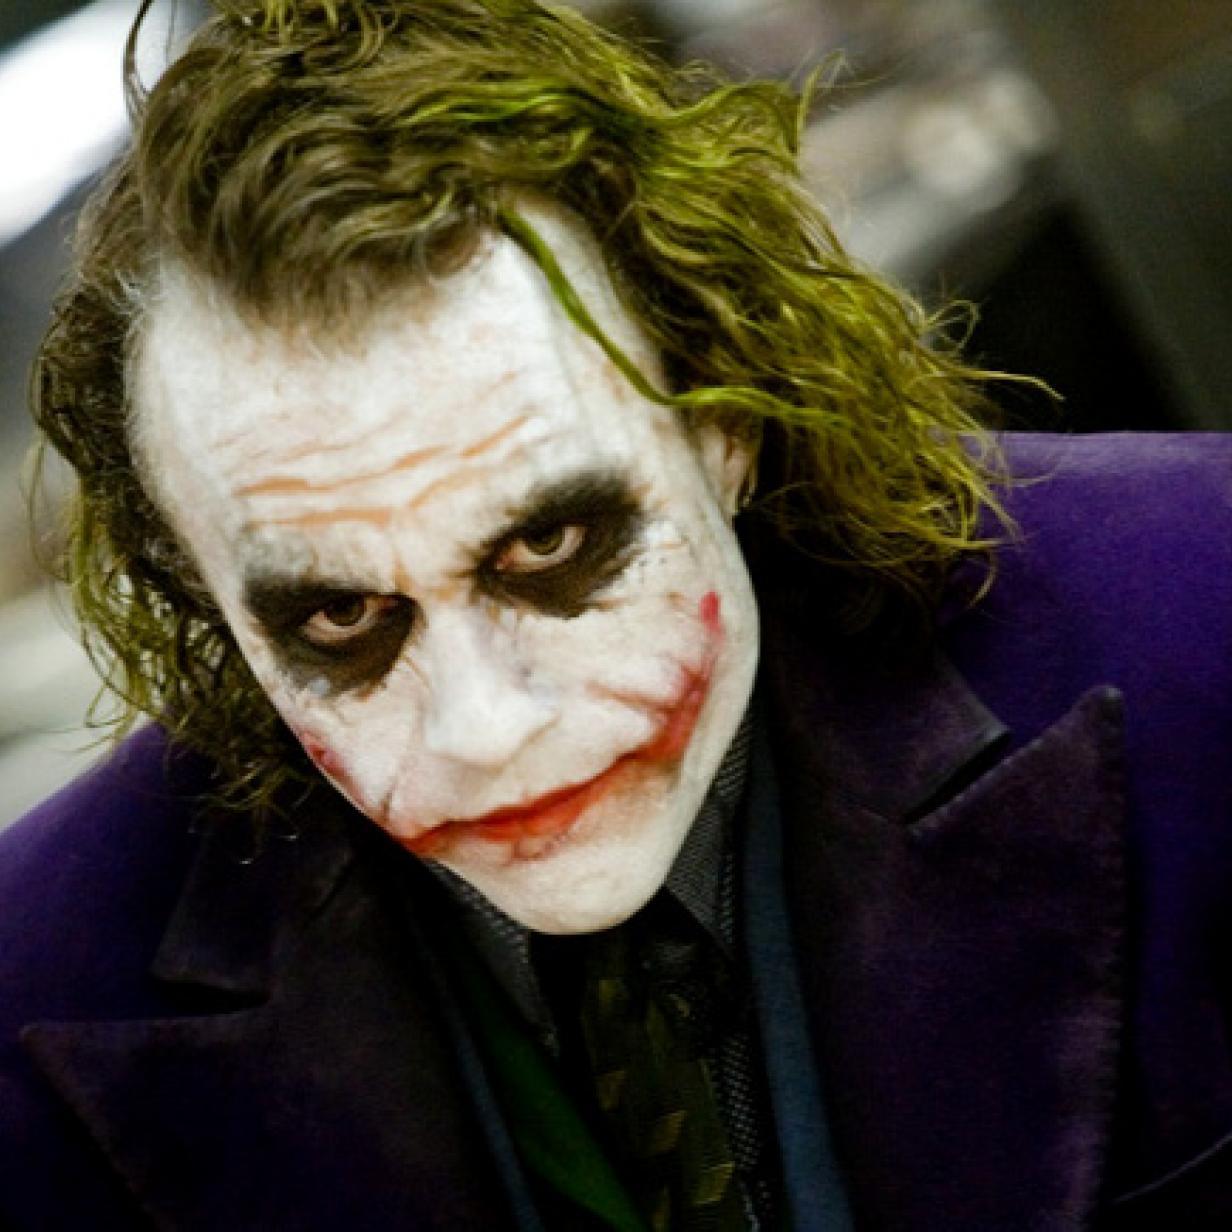 heath ledger the joker 133406 The 20 Biggest Ways Joker Breaks the Superhero Mold